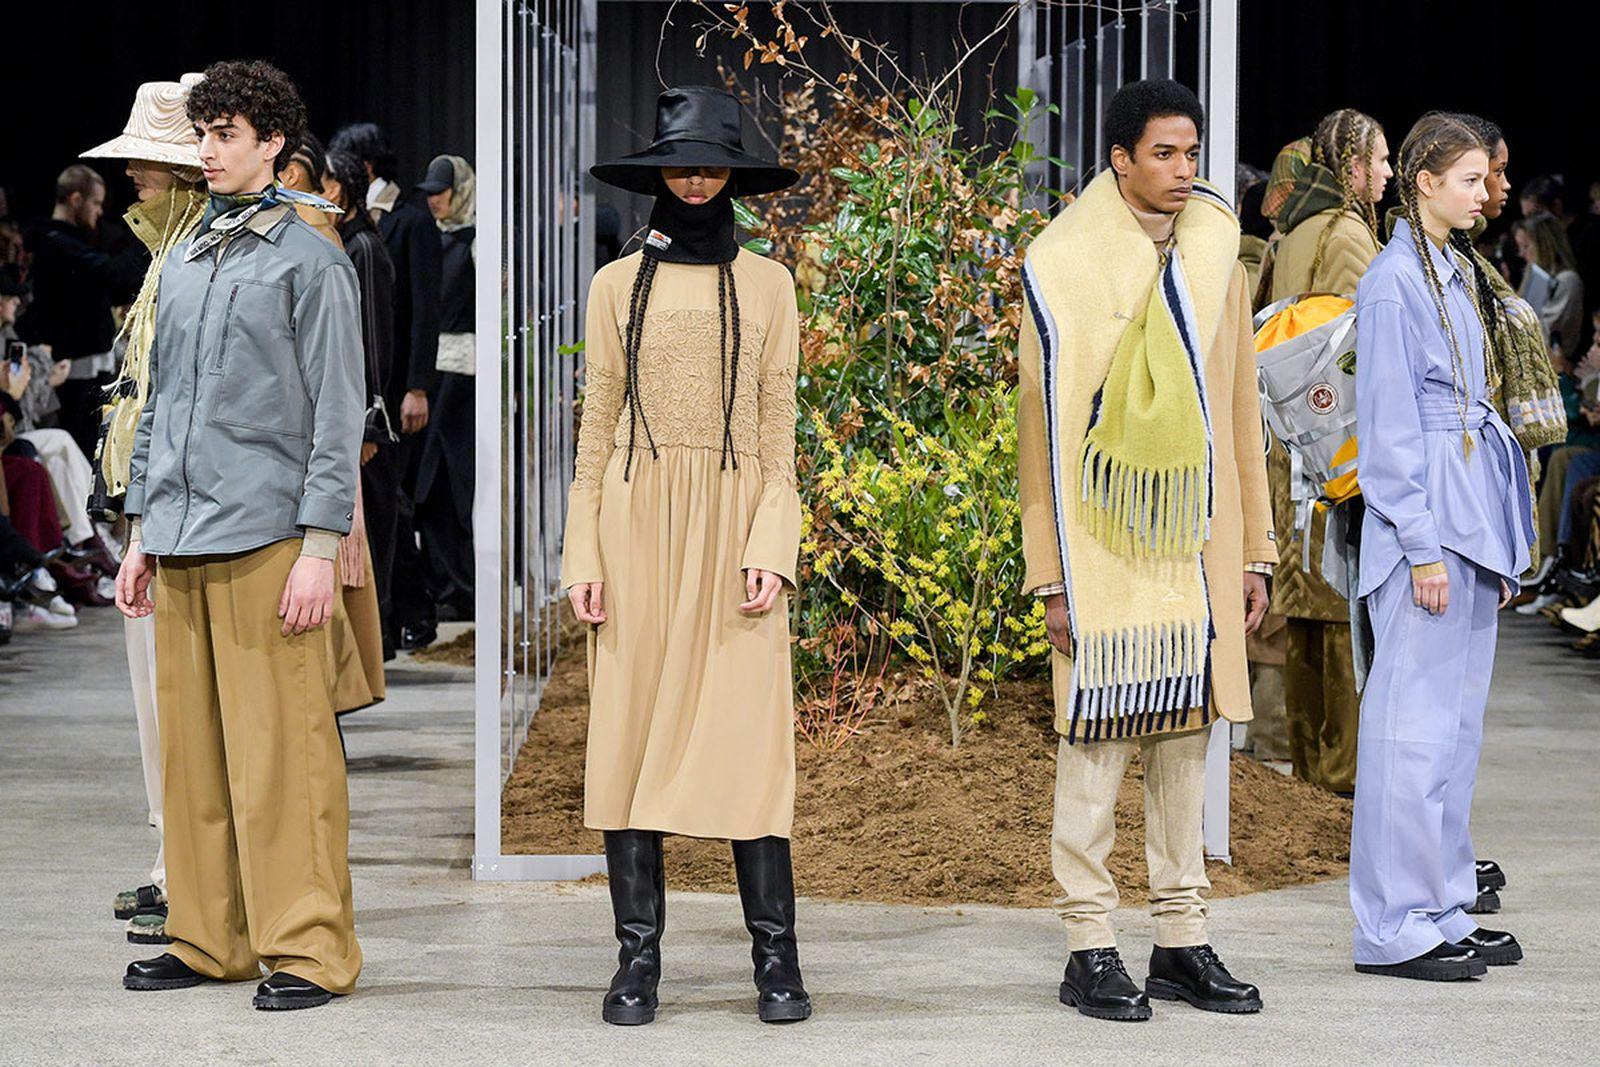 future-fashion-week-copenhagen-holz-01